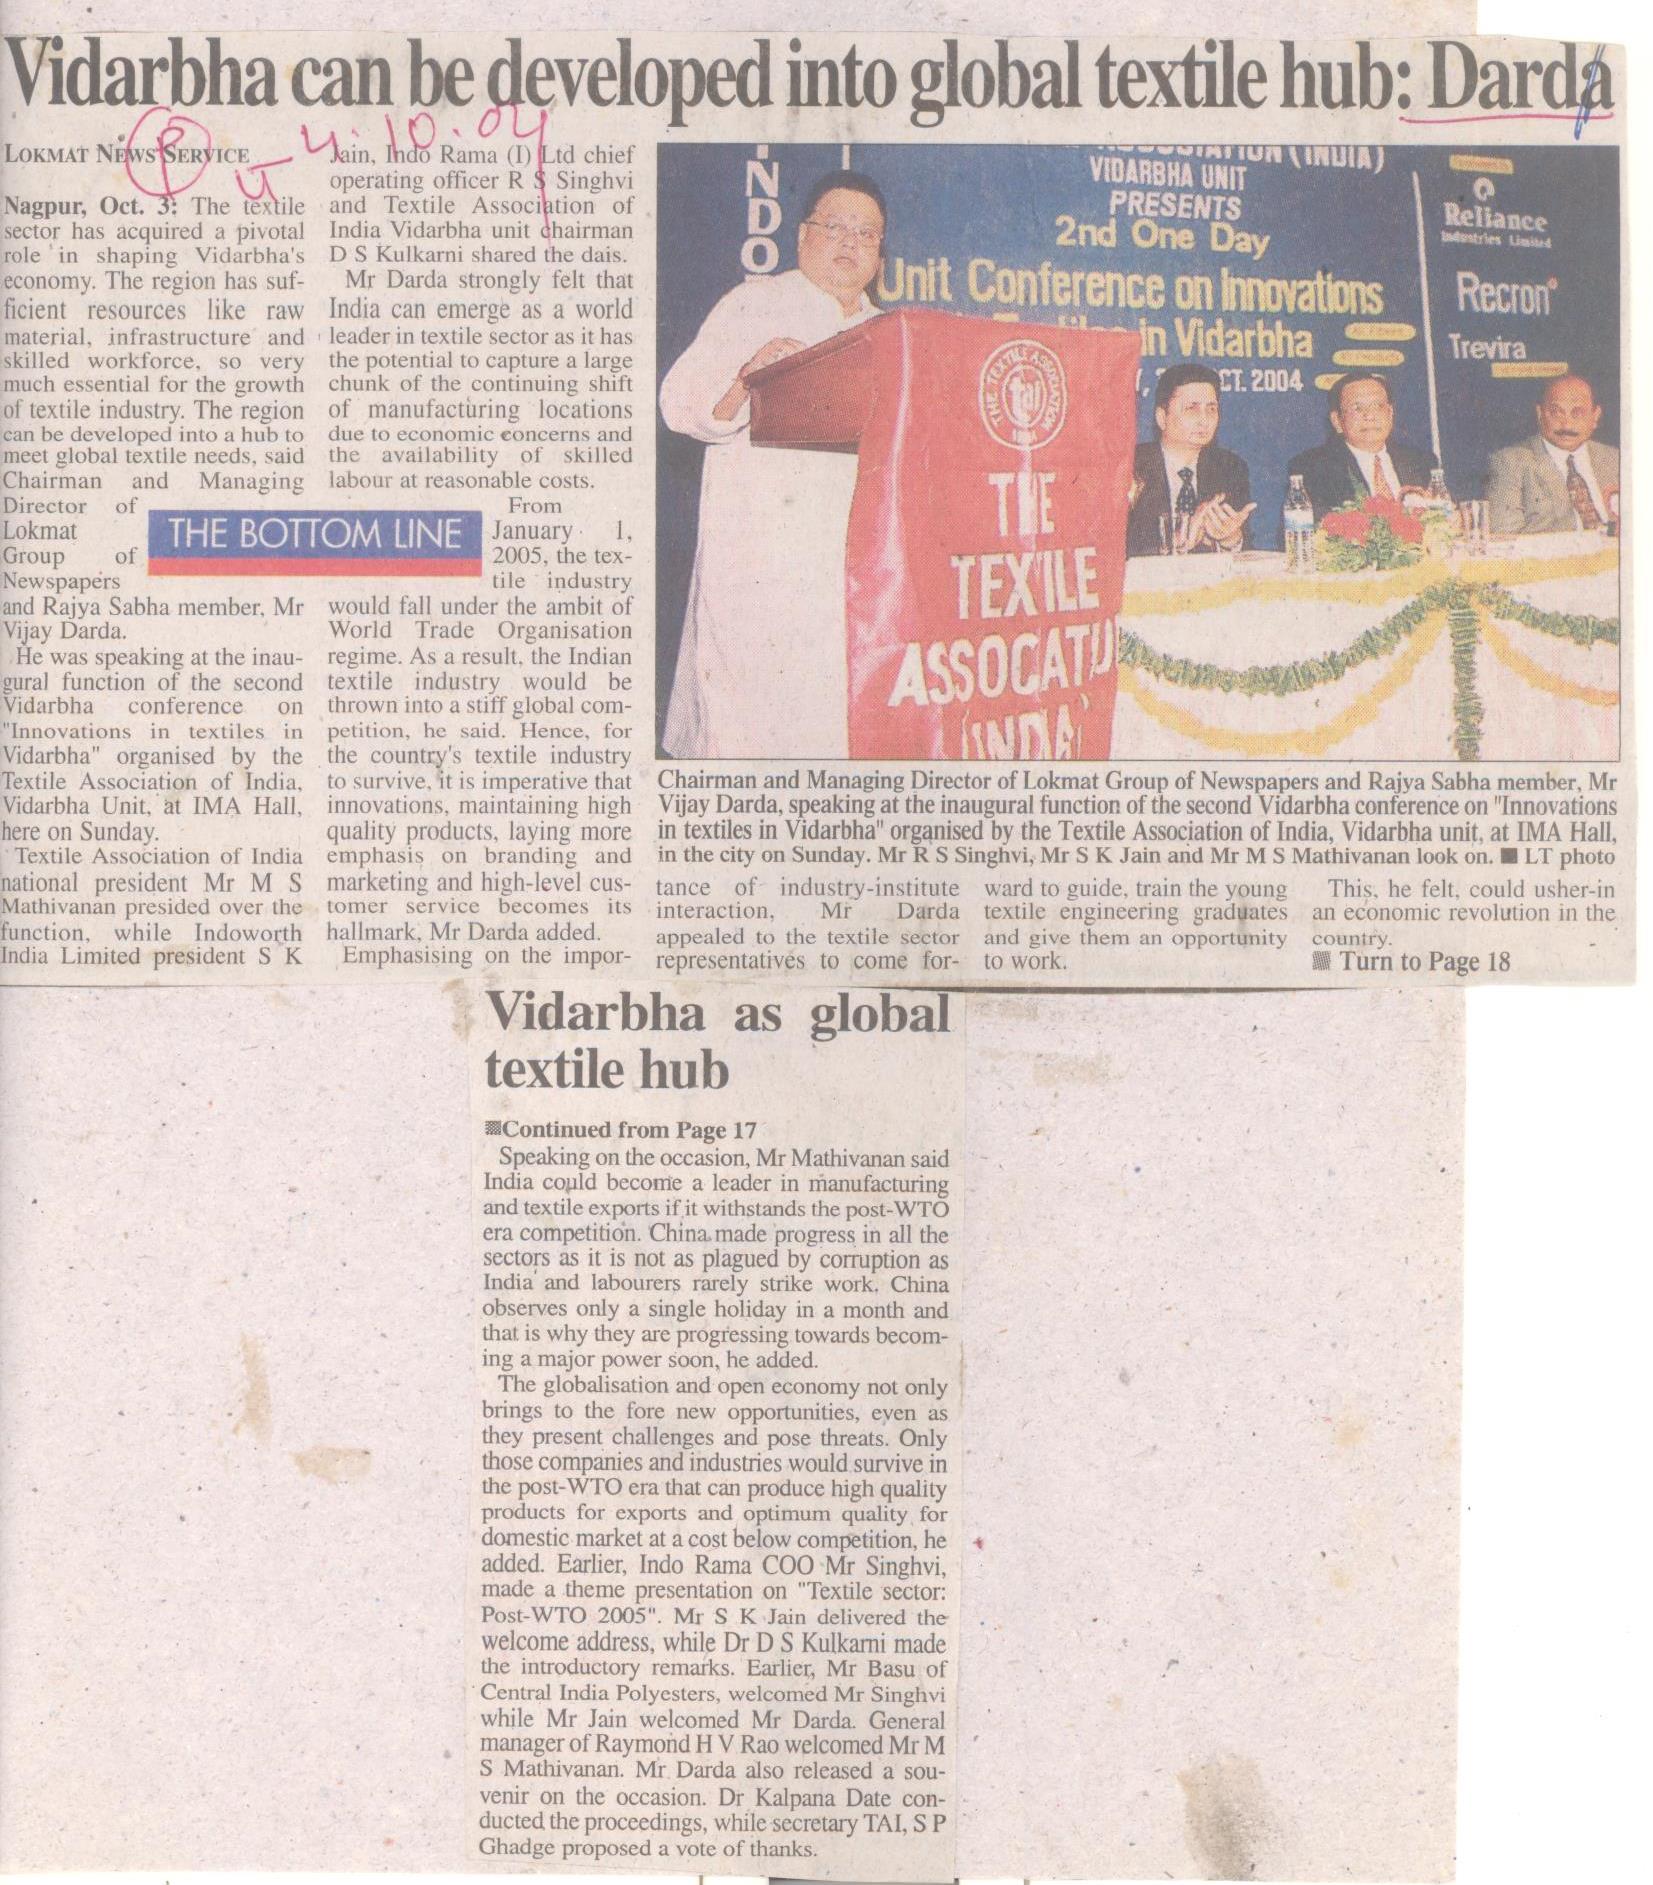 Vidarbha can be developed into global textile hub: Darda